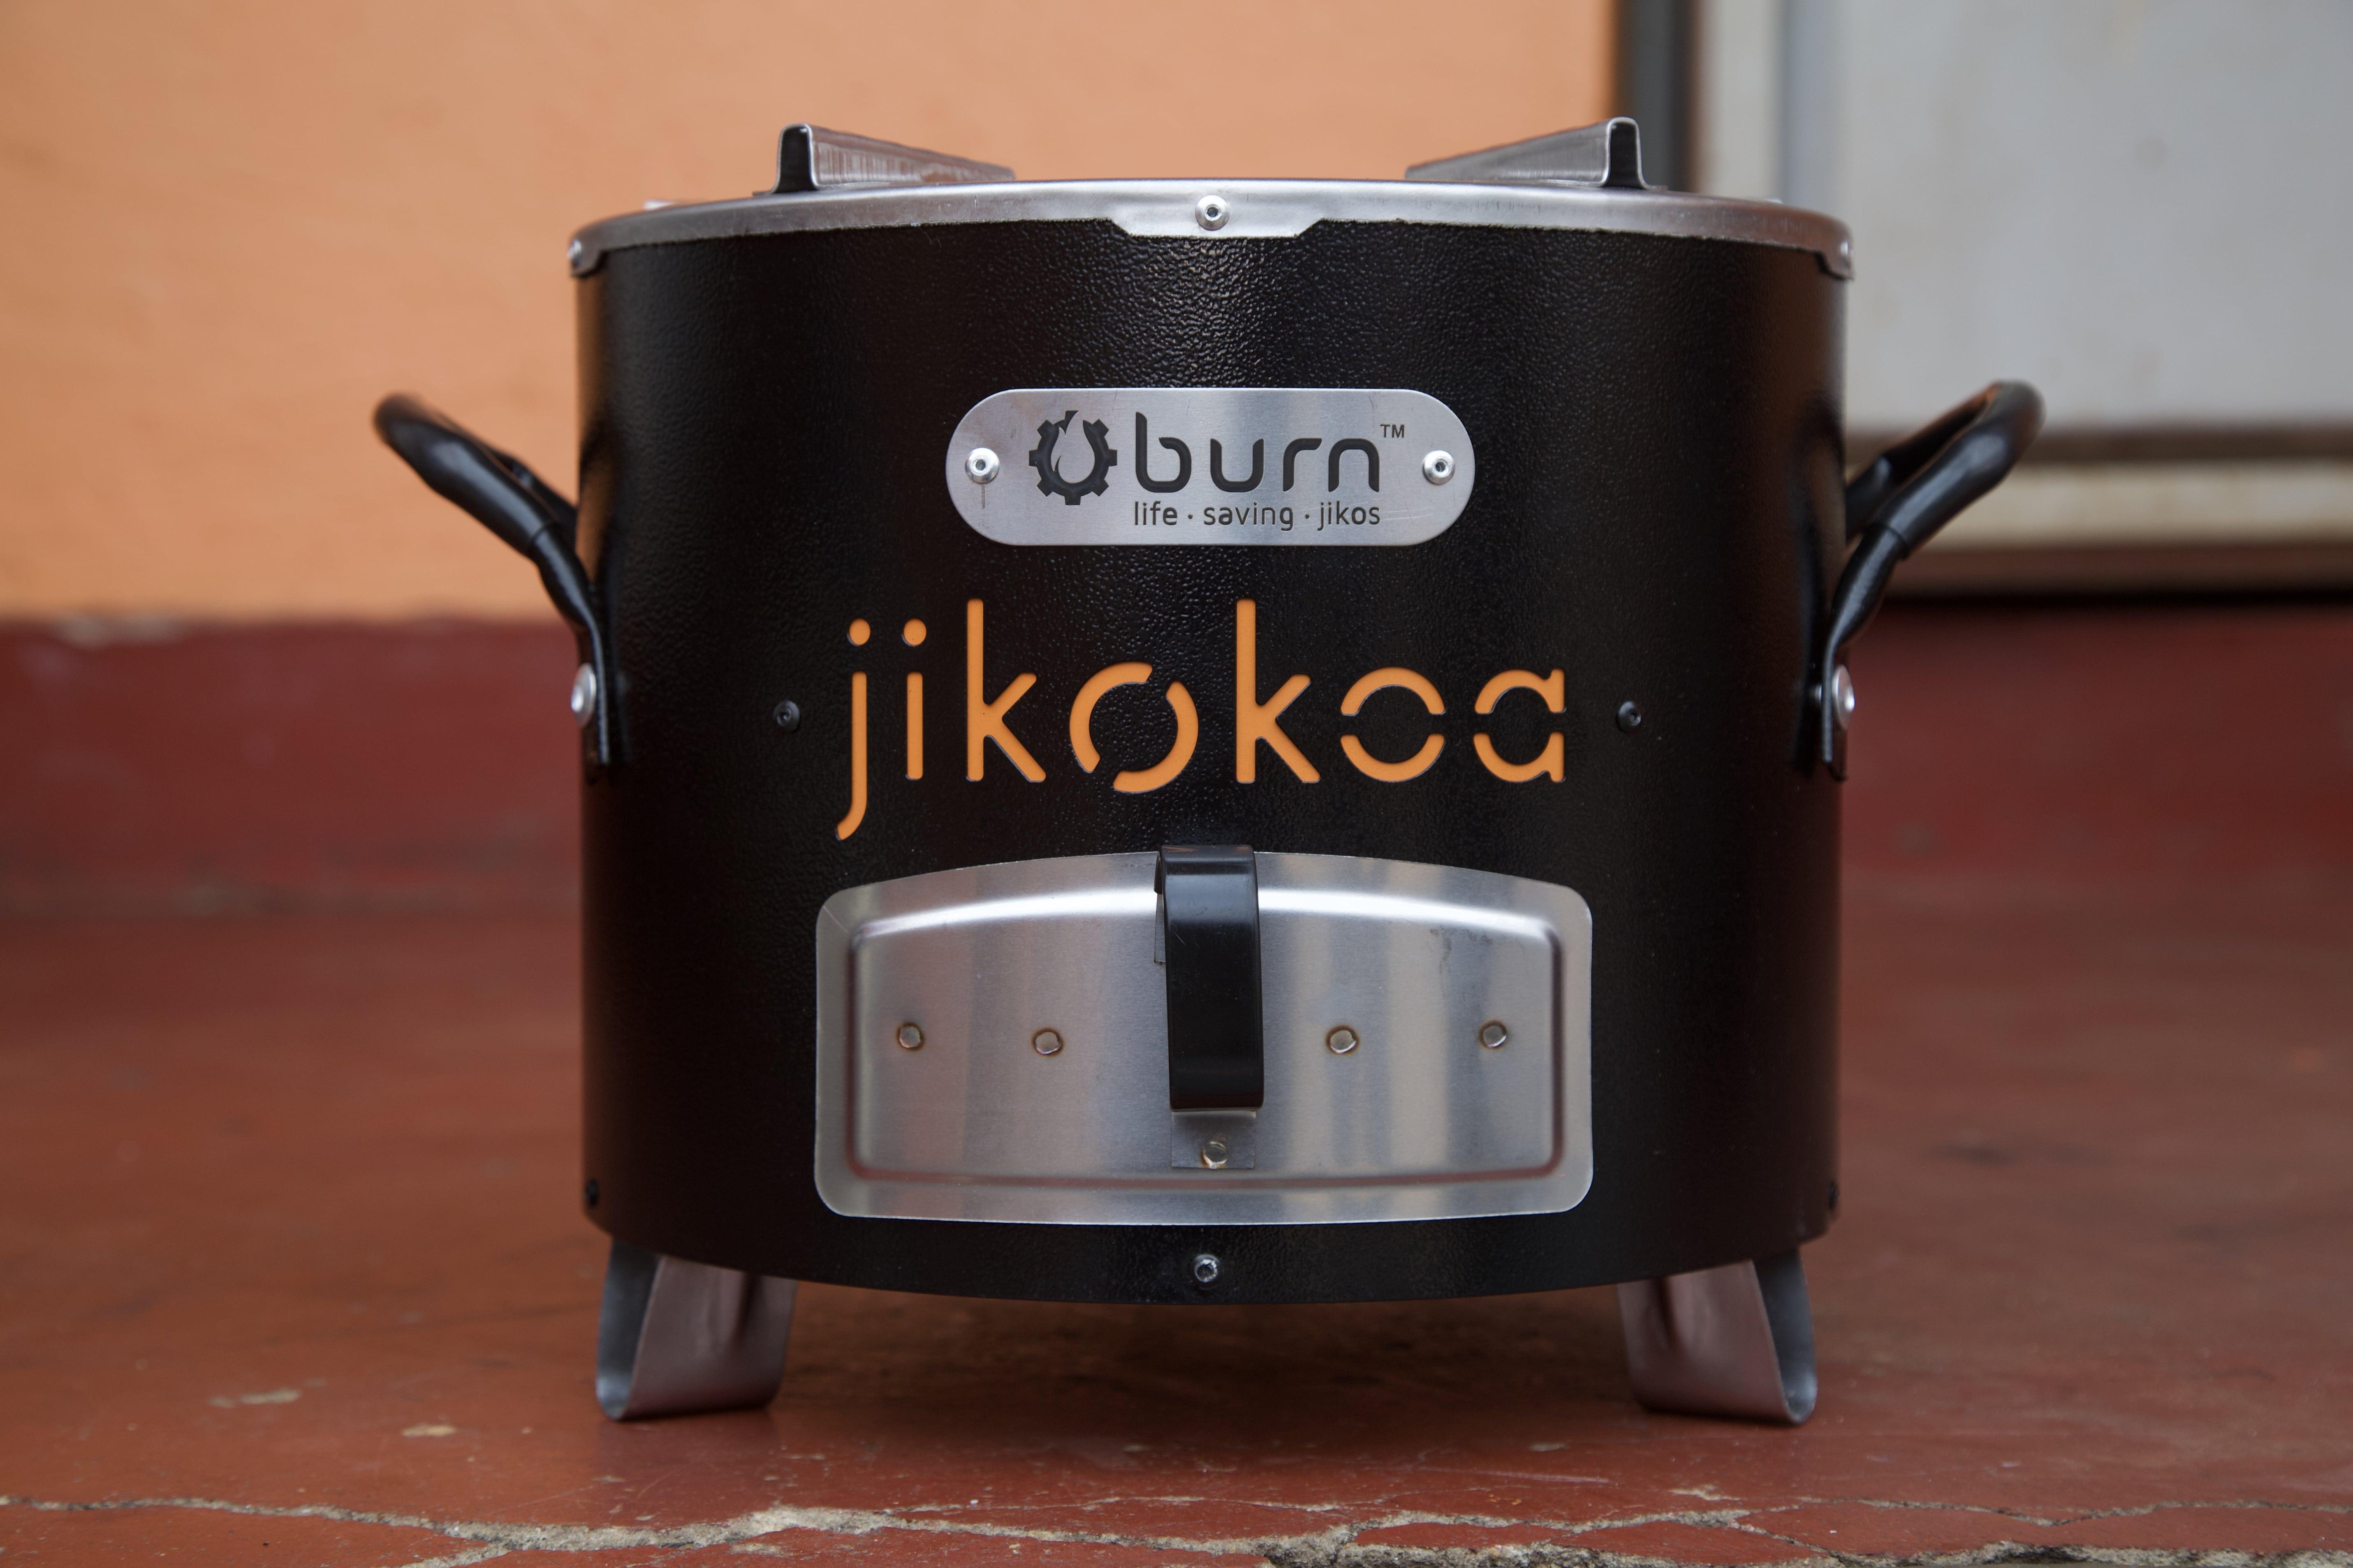 How durable are the Jikokoa stoves